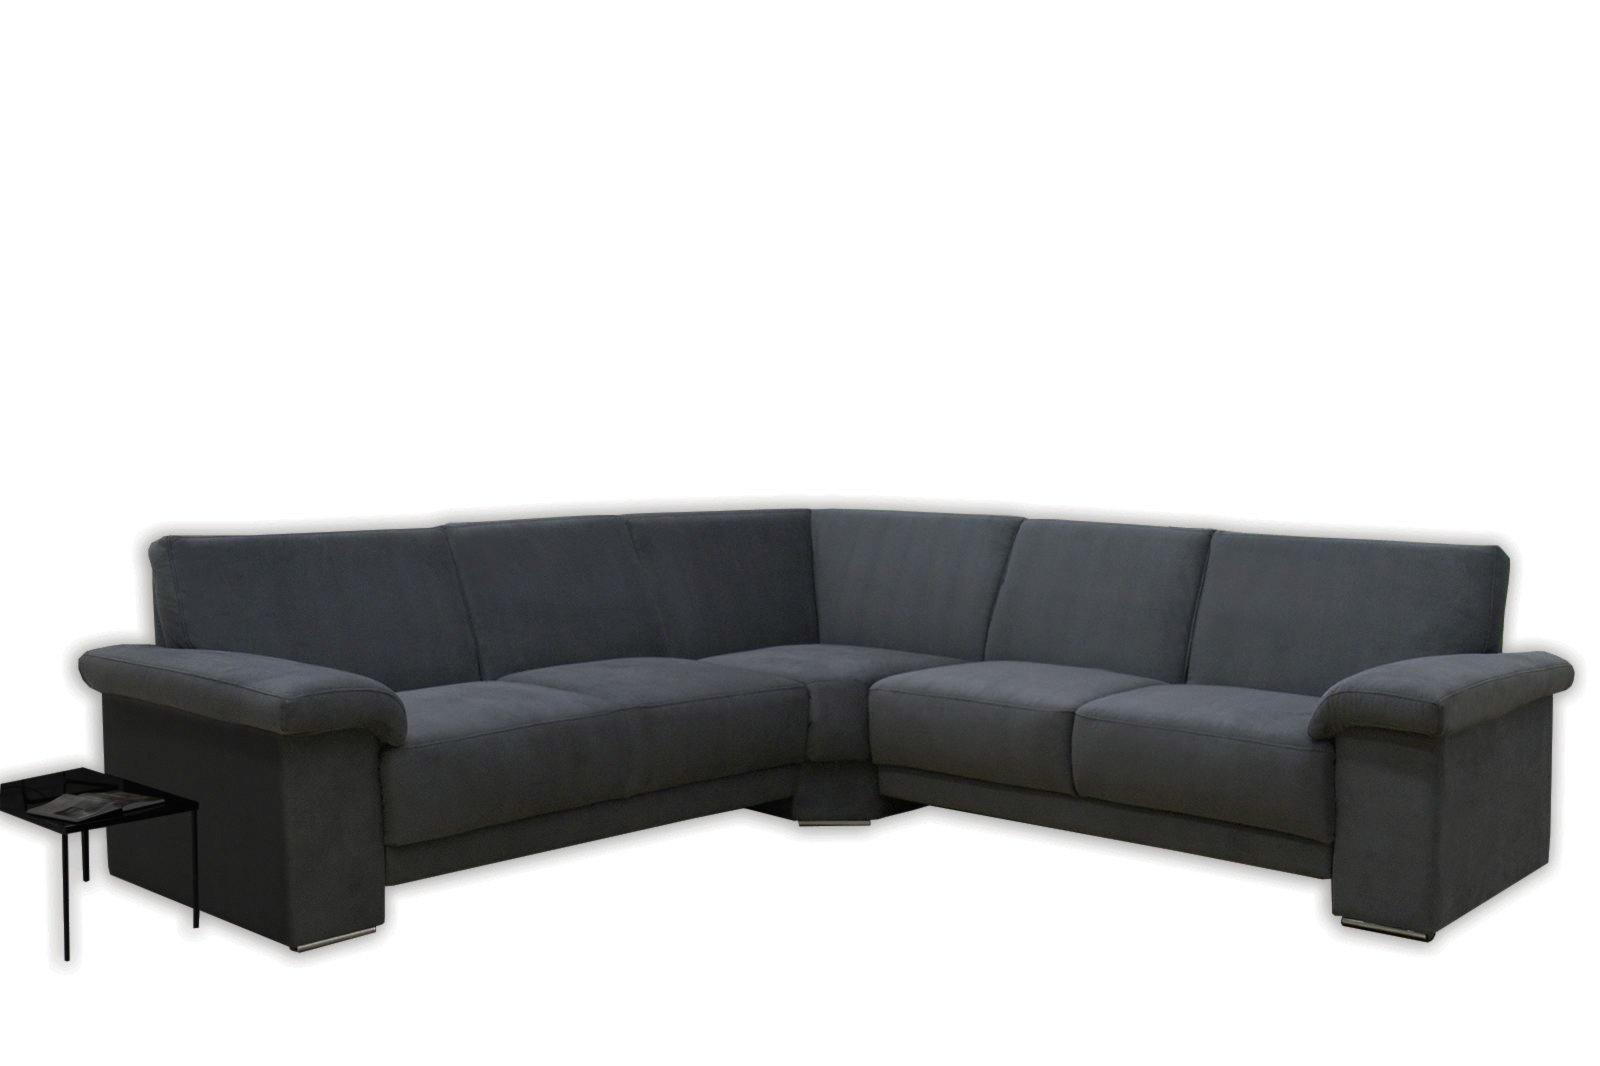 polsterecke dunkelgrau microfaser federkern ecksofas l form sofas couches m bel. Black Bedroom Furniture Sets. Home Design Ideas